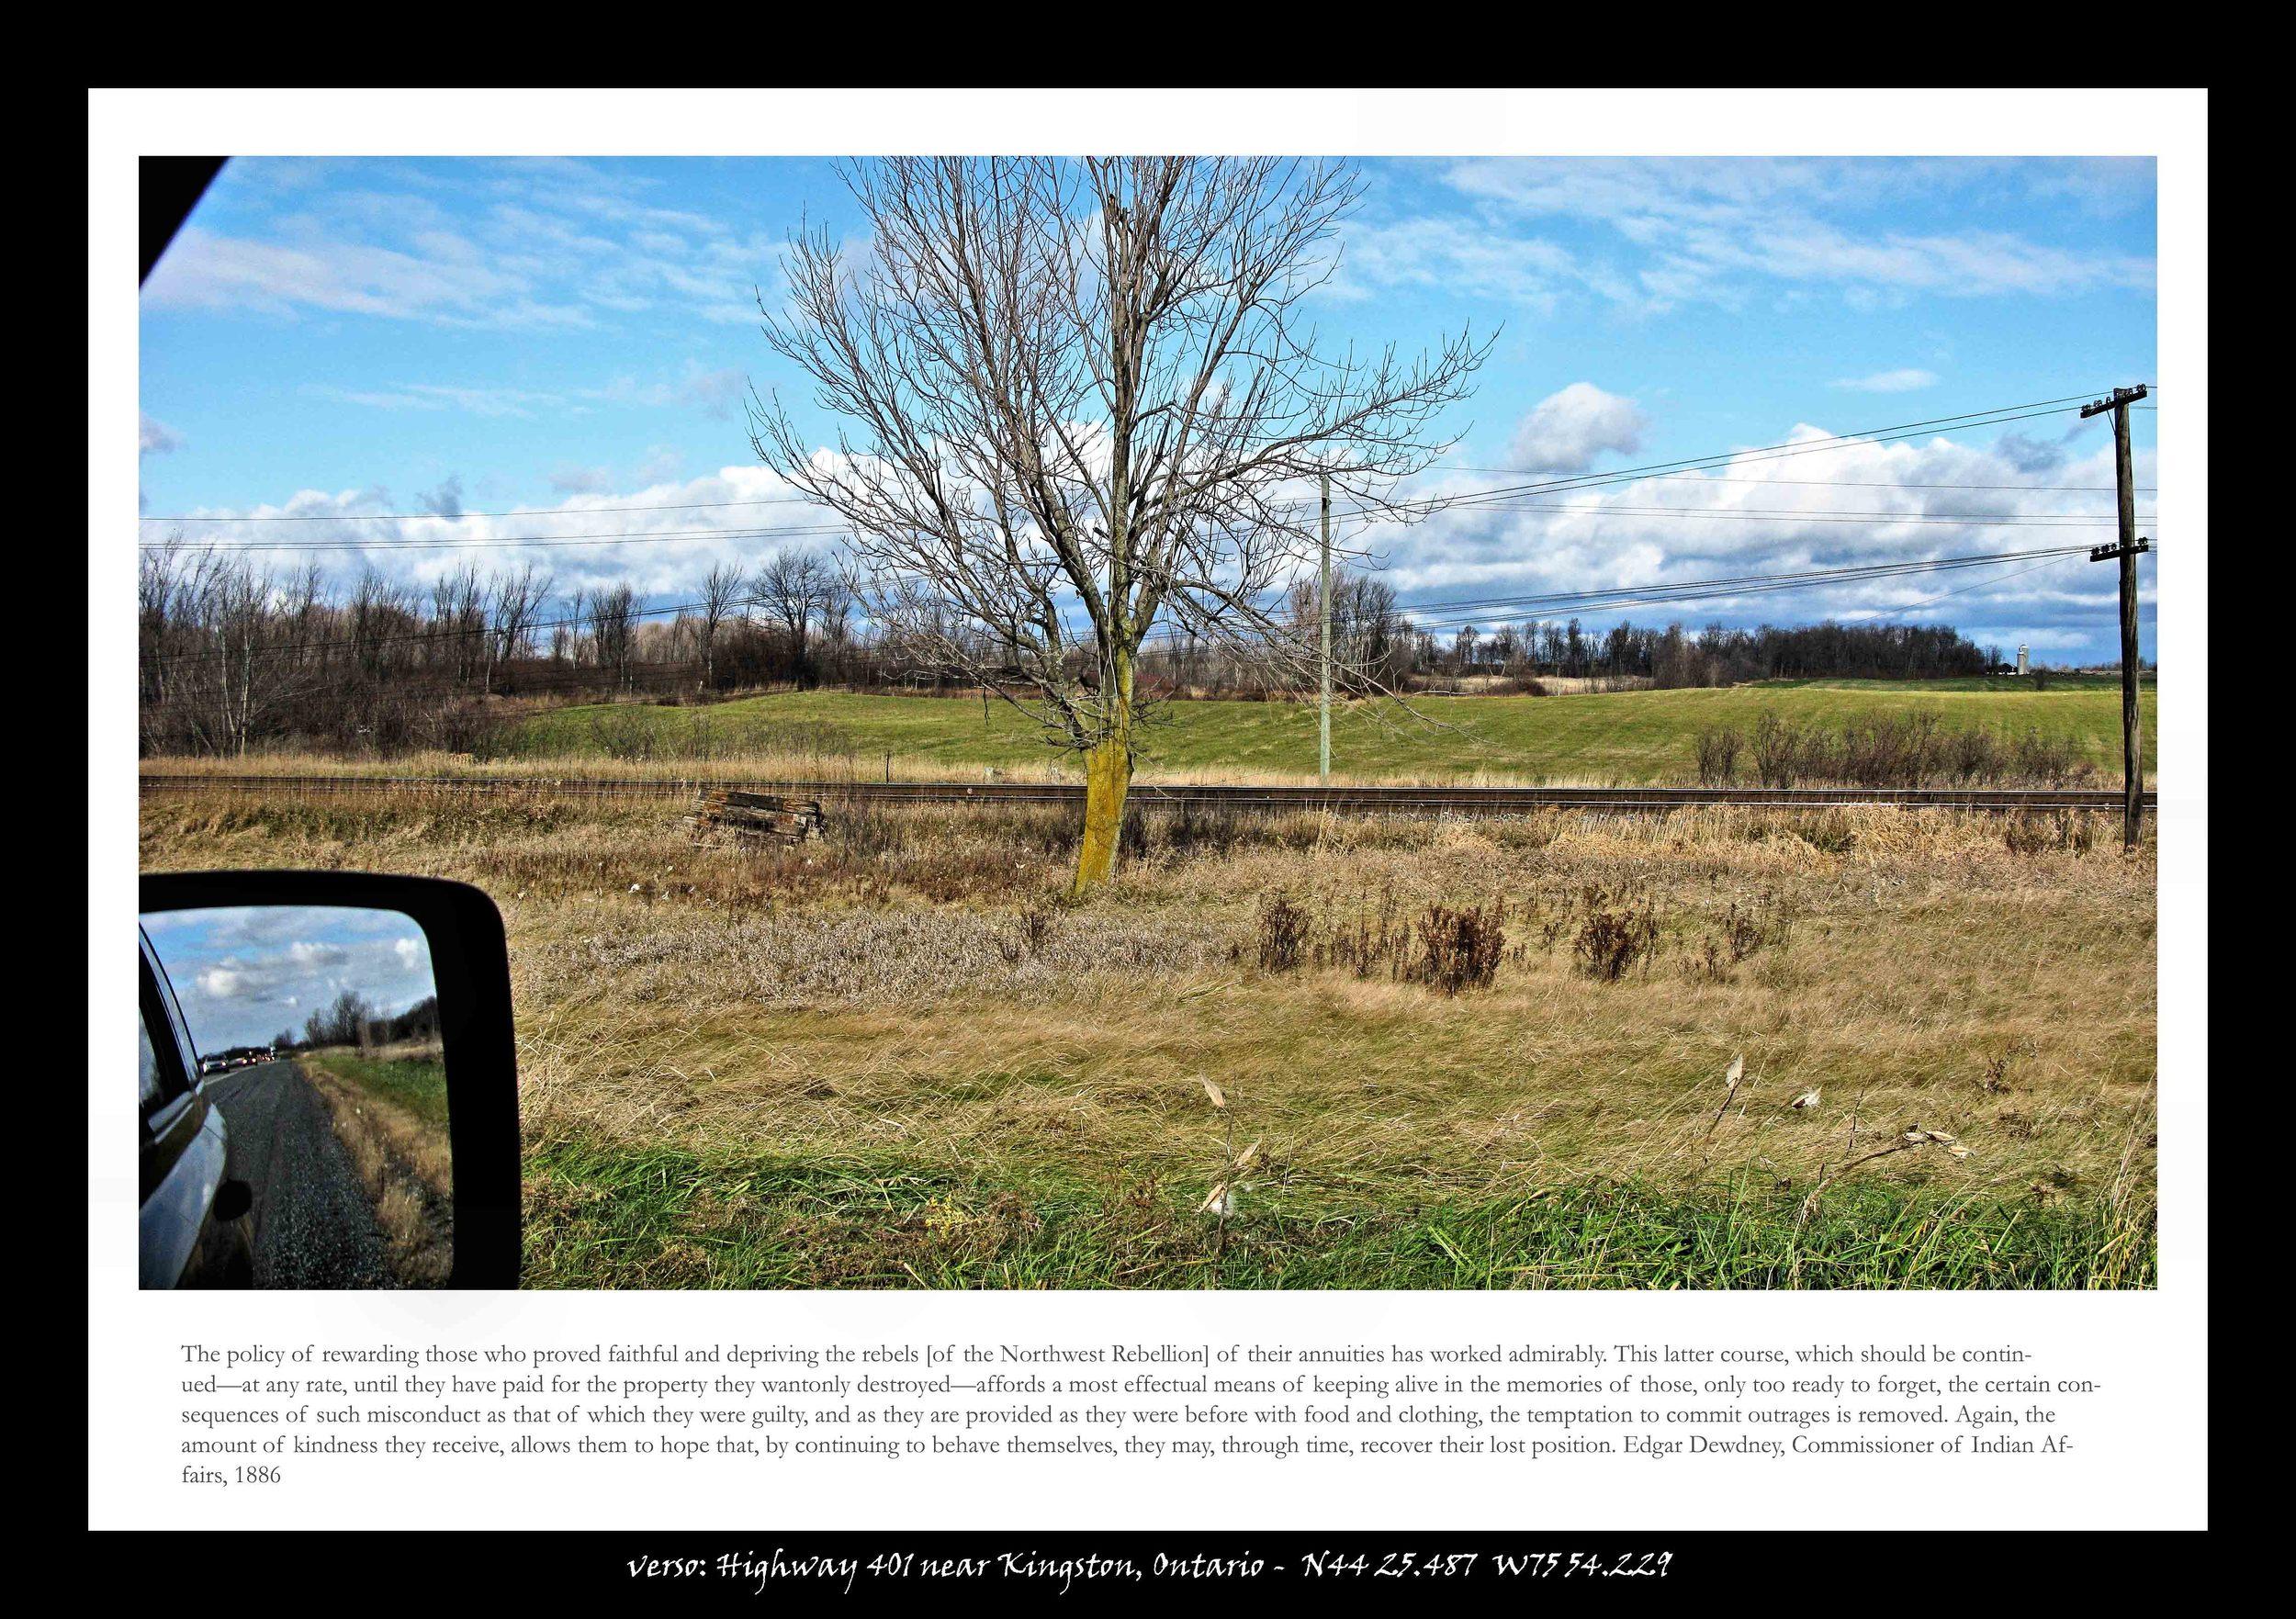 40. Highway 401, Kingston, Ontario area .jpg